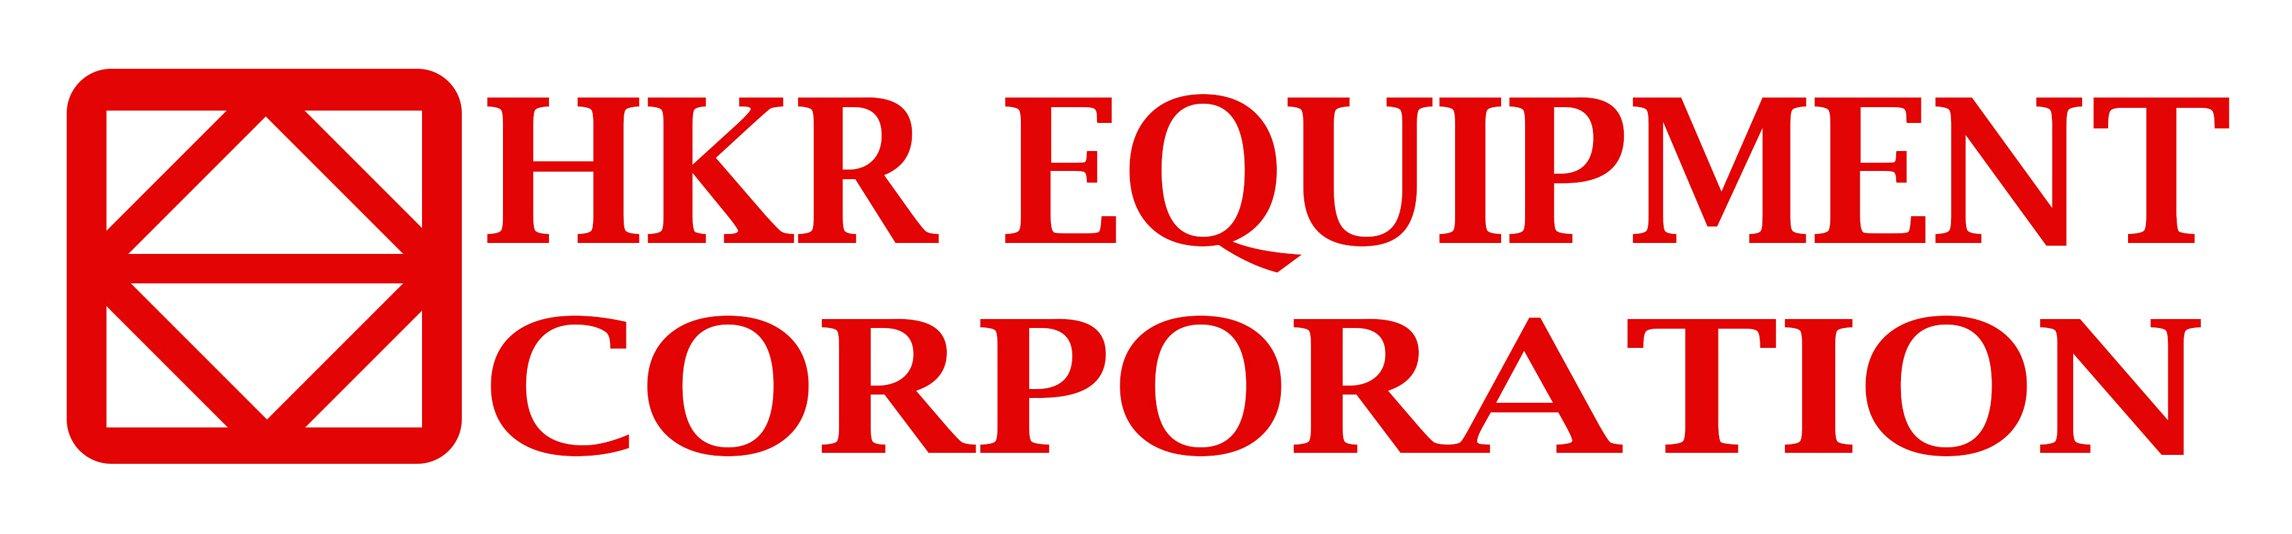 HKR Equipment Corporation